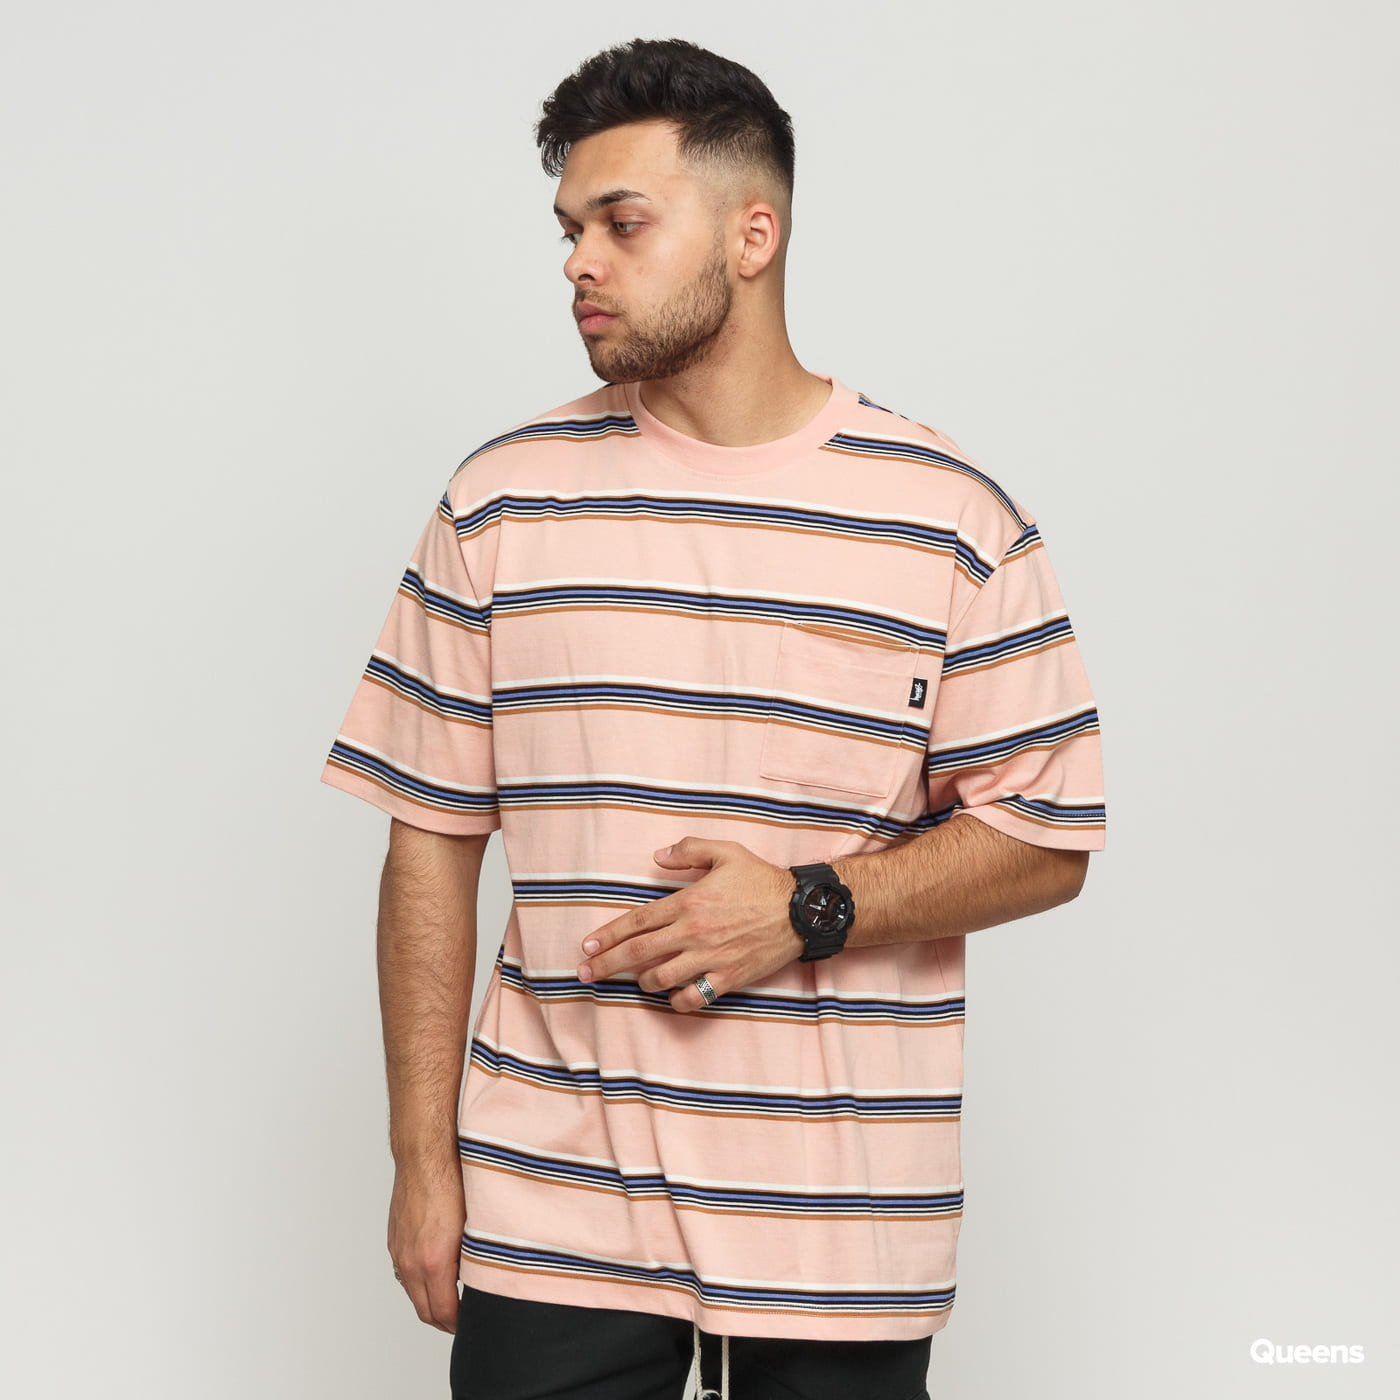 deff85a1b0 Short Sleeve T-Shirts Stüssy Malcom Stripe Crew pink / white / black /  purple (1140143 / 0609) – Queens 💚